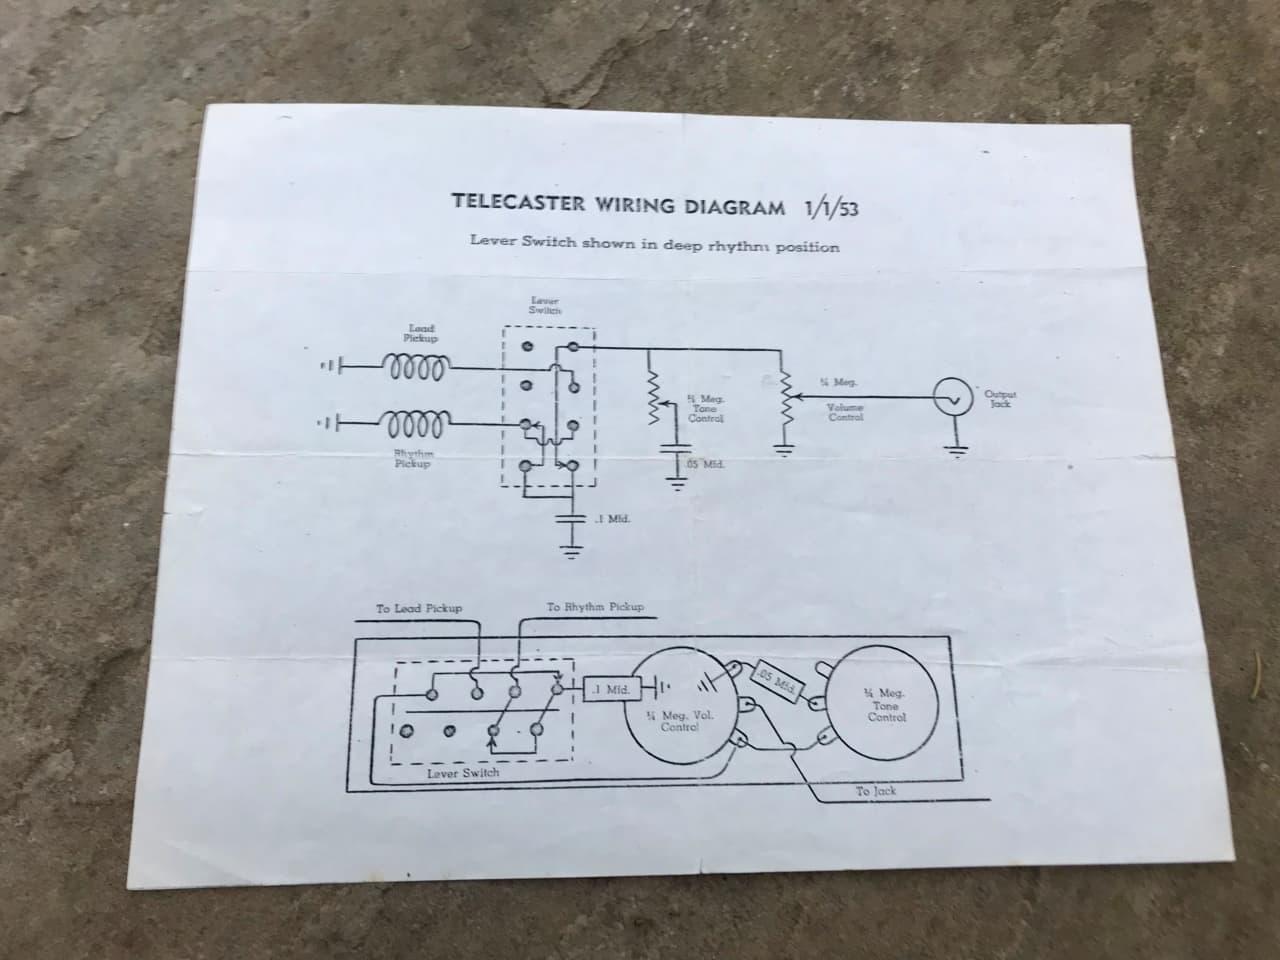 Vintage Fender Telecaster wiring diagram 1953 | Reverb